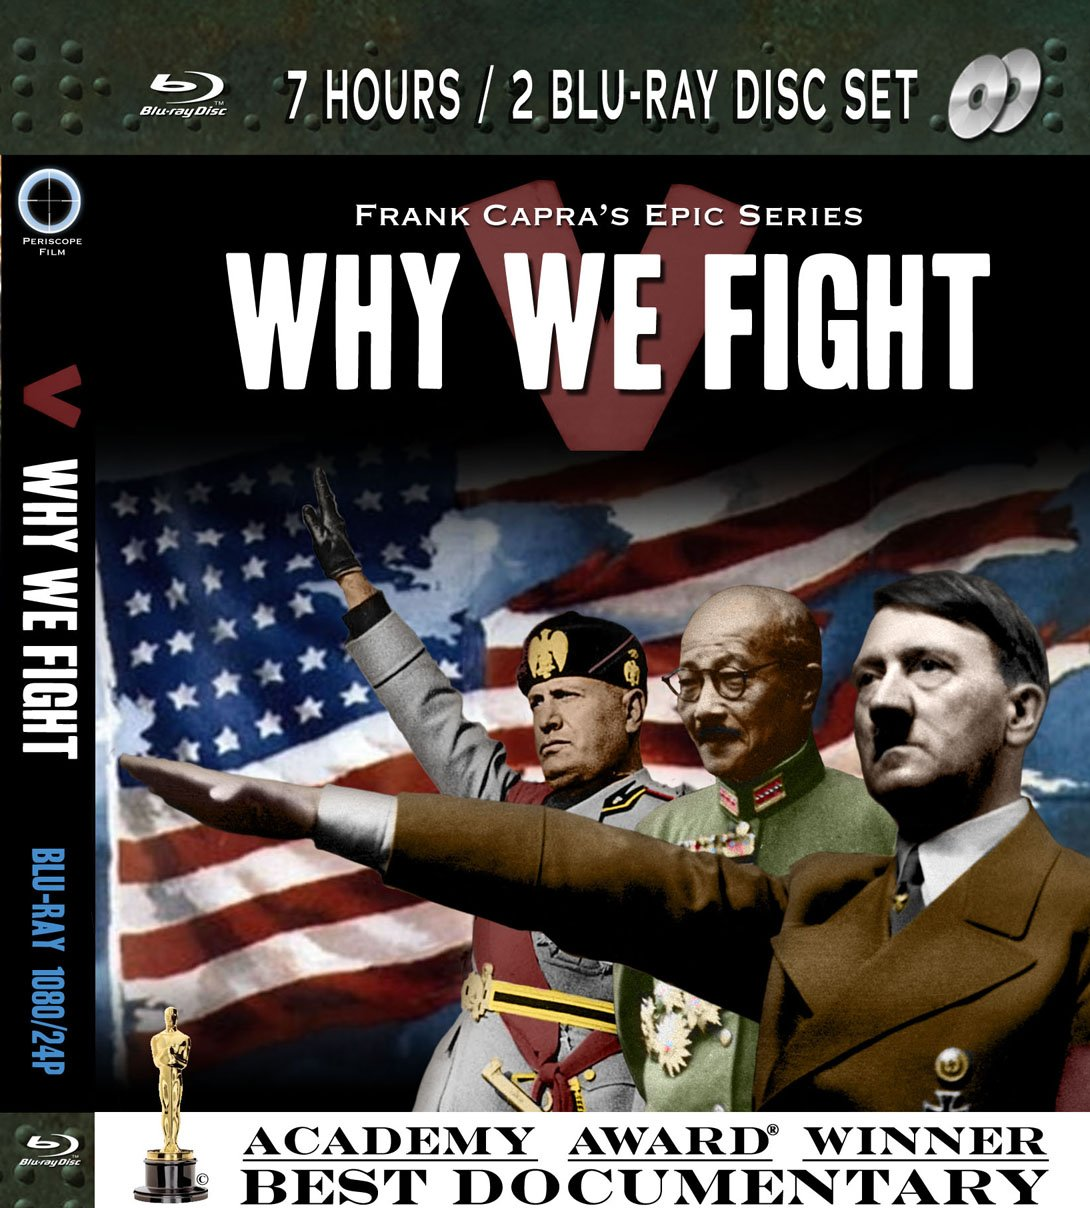 WHY WE FIGHT Frank Capra's Epic Documentary Series 2 Blu-Ray Disc Set